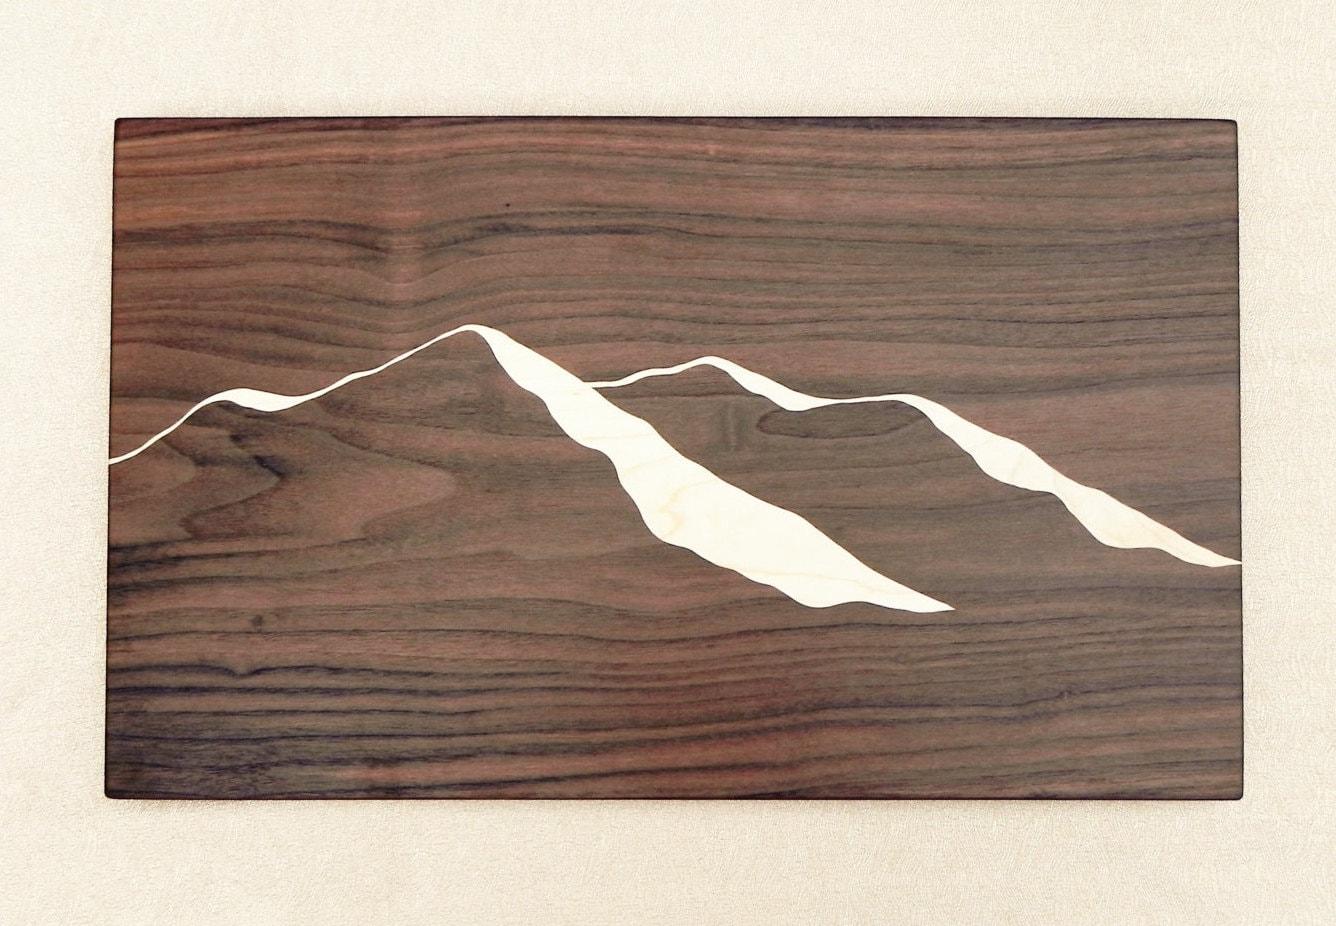 Unique Dark Wood Cutting Board With Mountain Ridge View